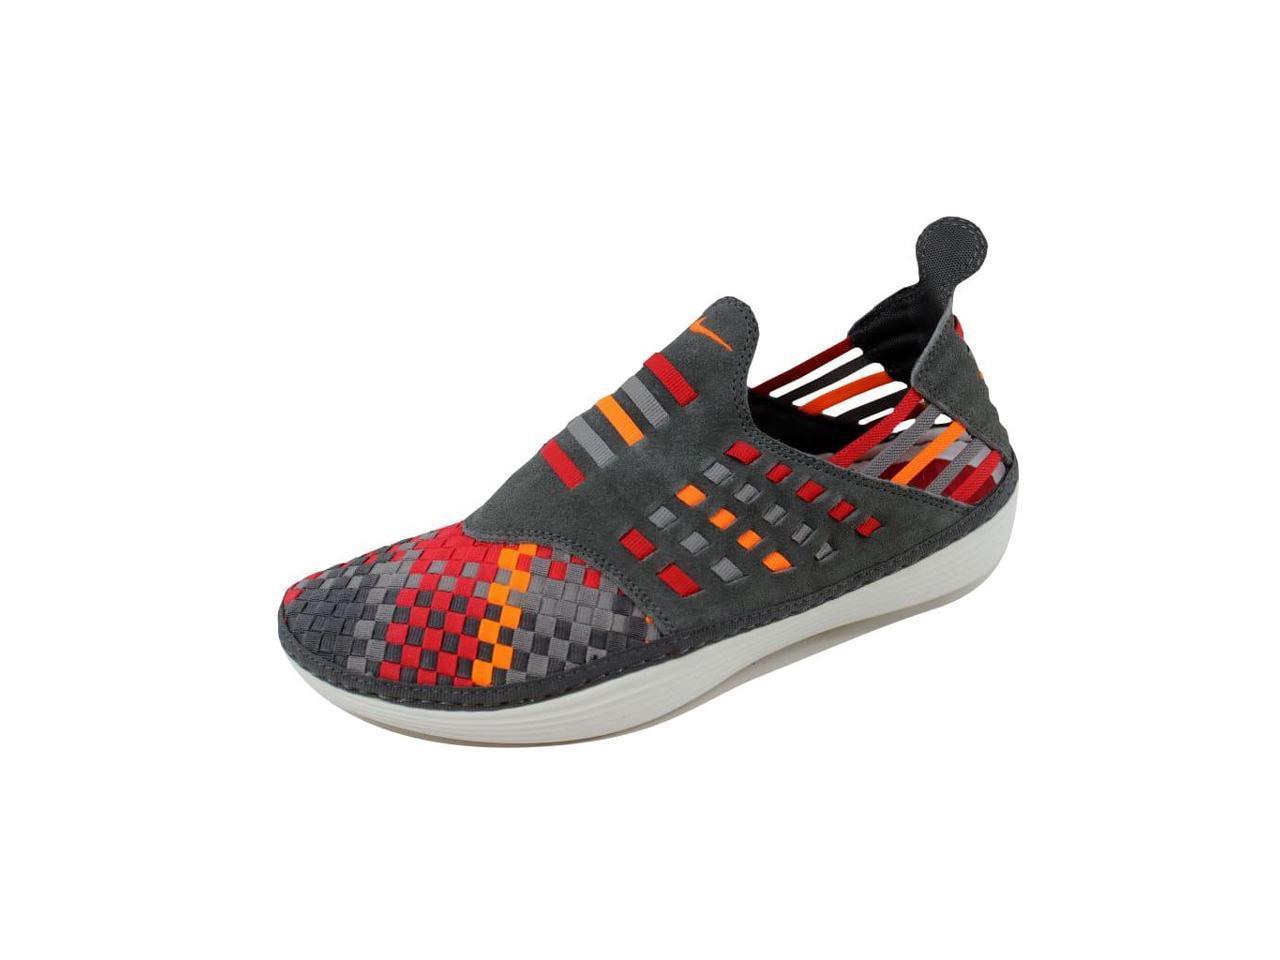 Nike Men's Solarsoft Rache Woven Premium Midnight Fog/Total 8 Orange-Sport Grey 555349-080 Size 8 Fog/Total f1d56f